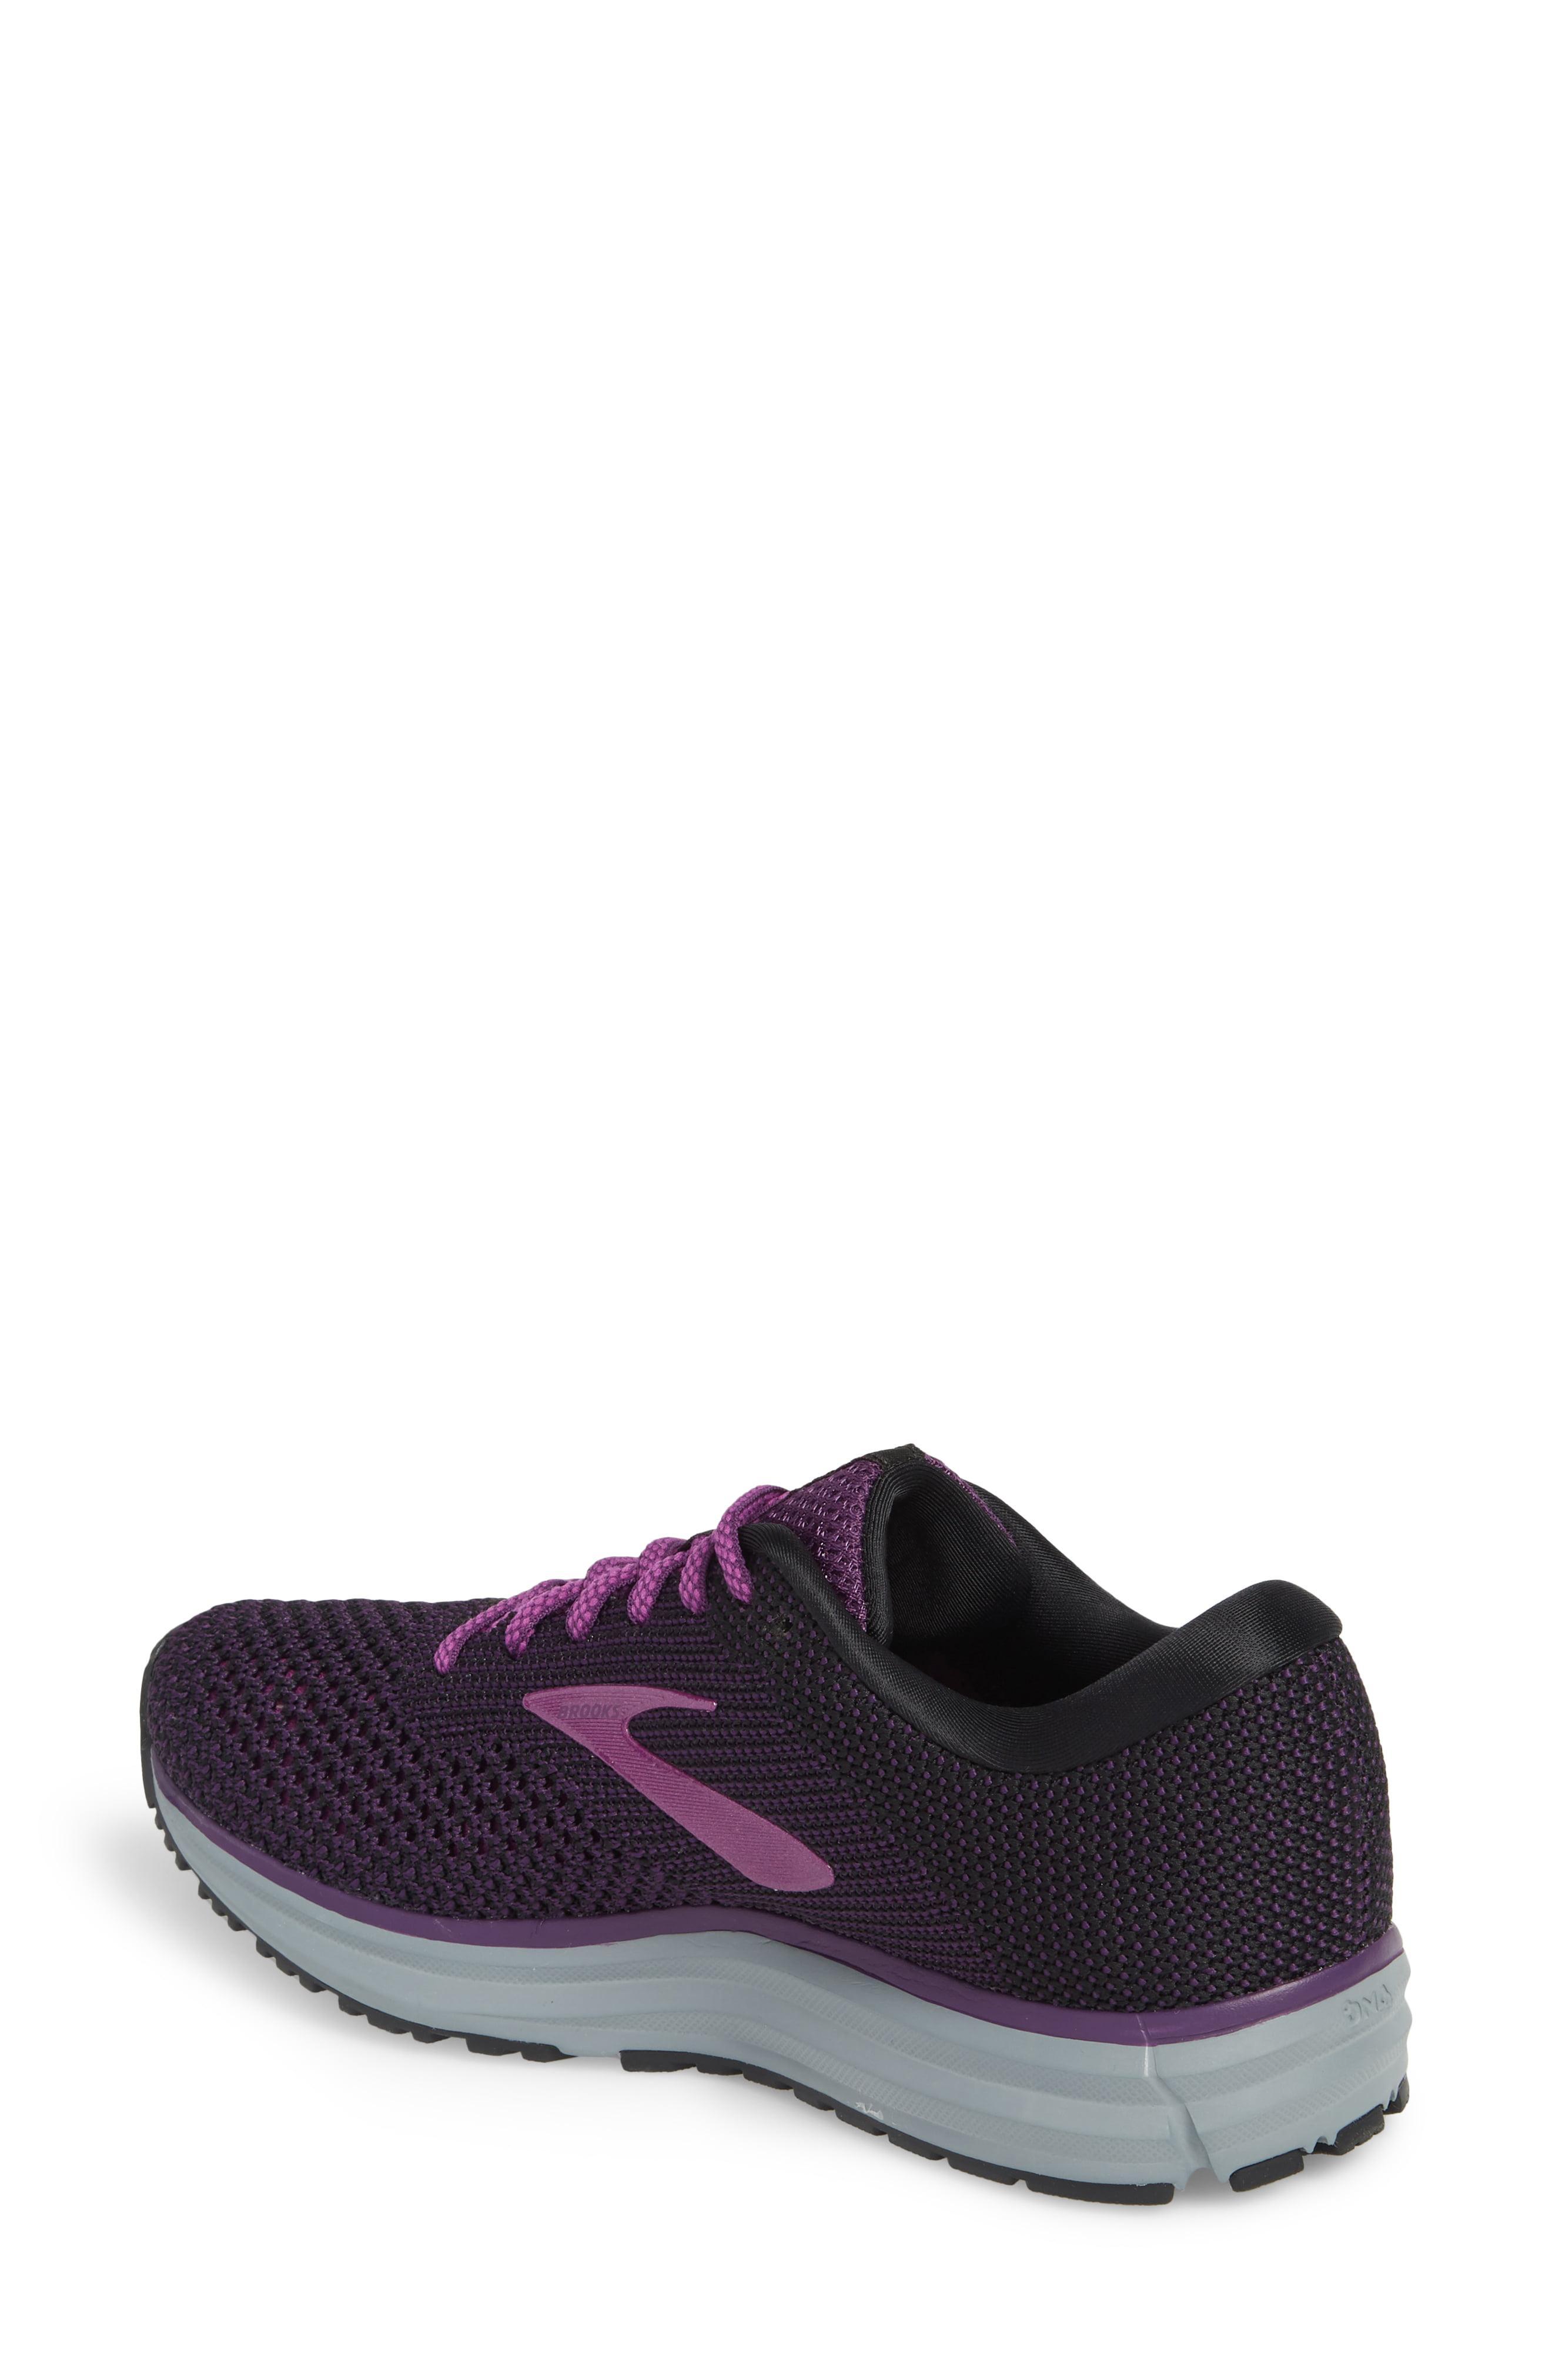 78b0efaa68c Lyst - Brooks Revel 2 Running Shoe in Purple - Save 20%